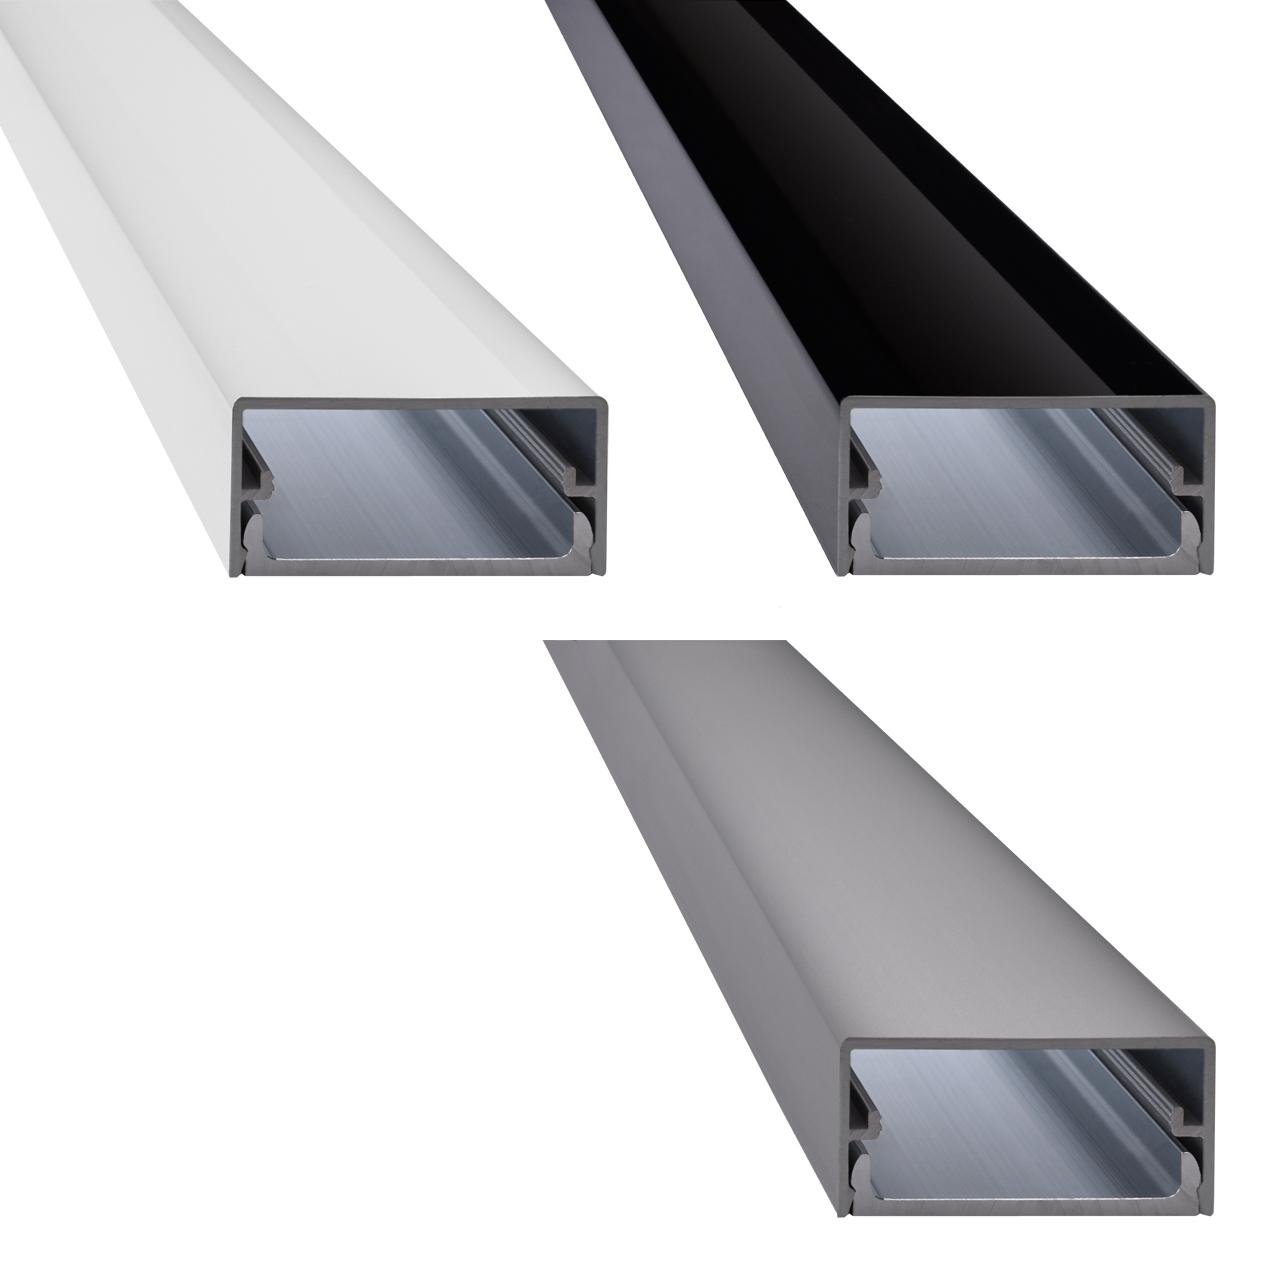 ac design aluminium kabelkanal big square wei weiss schwarz silber ebay. Black Bedroom Furniture Sets. Home Design Ideas